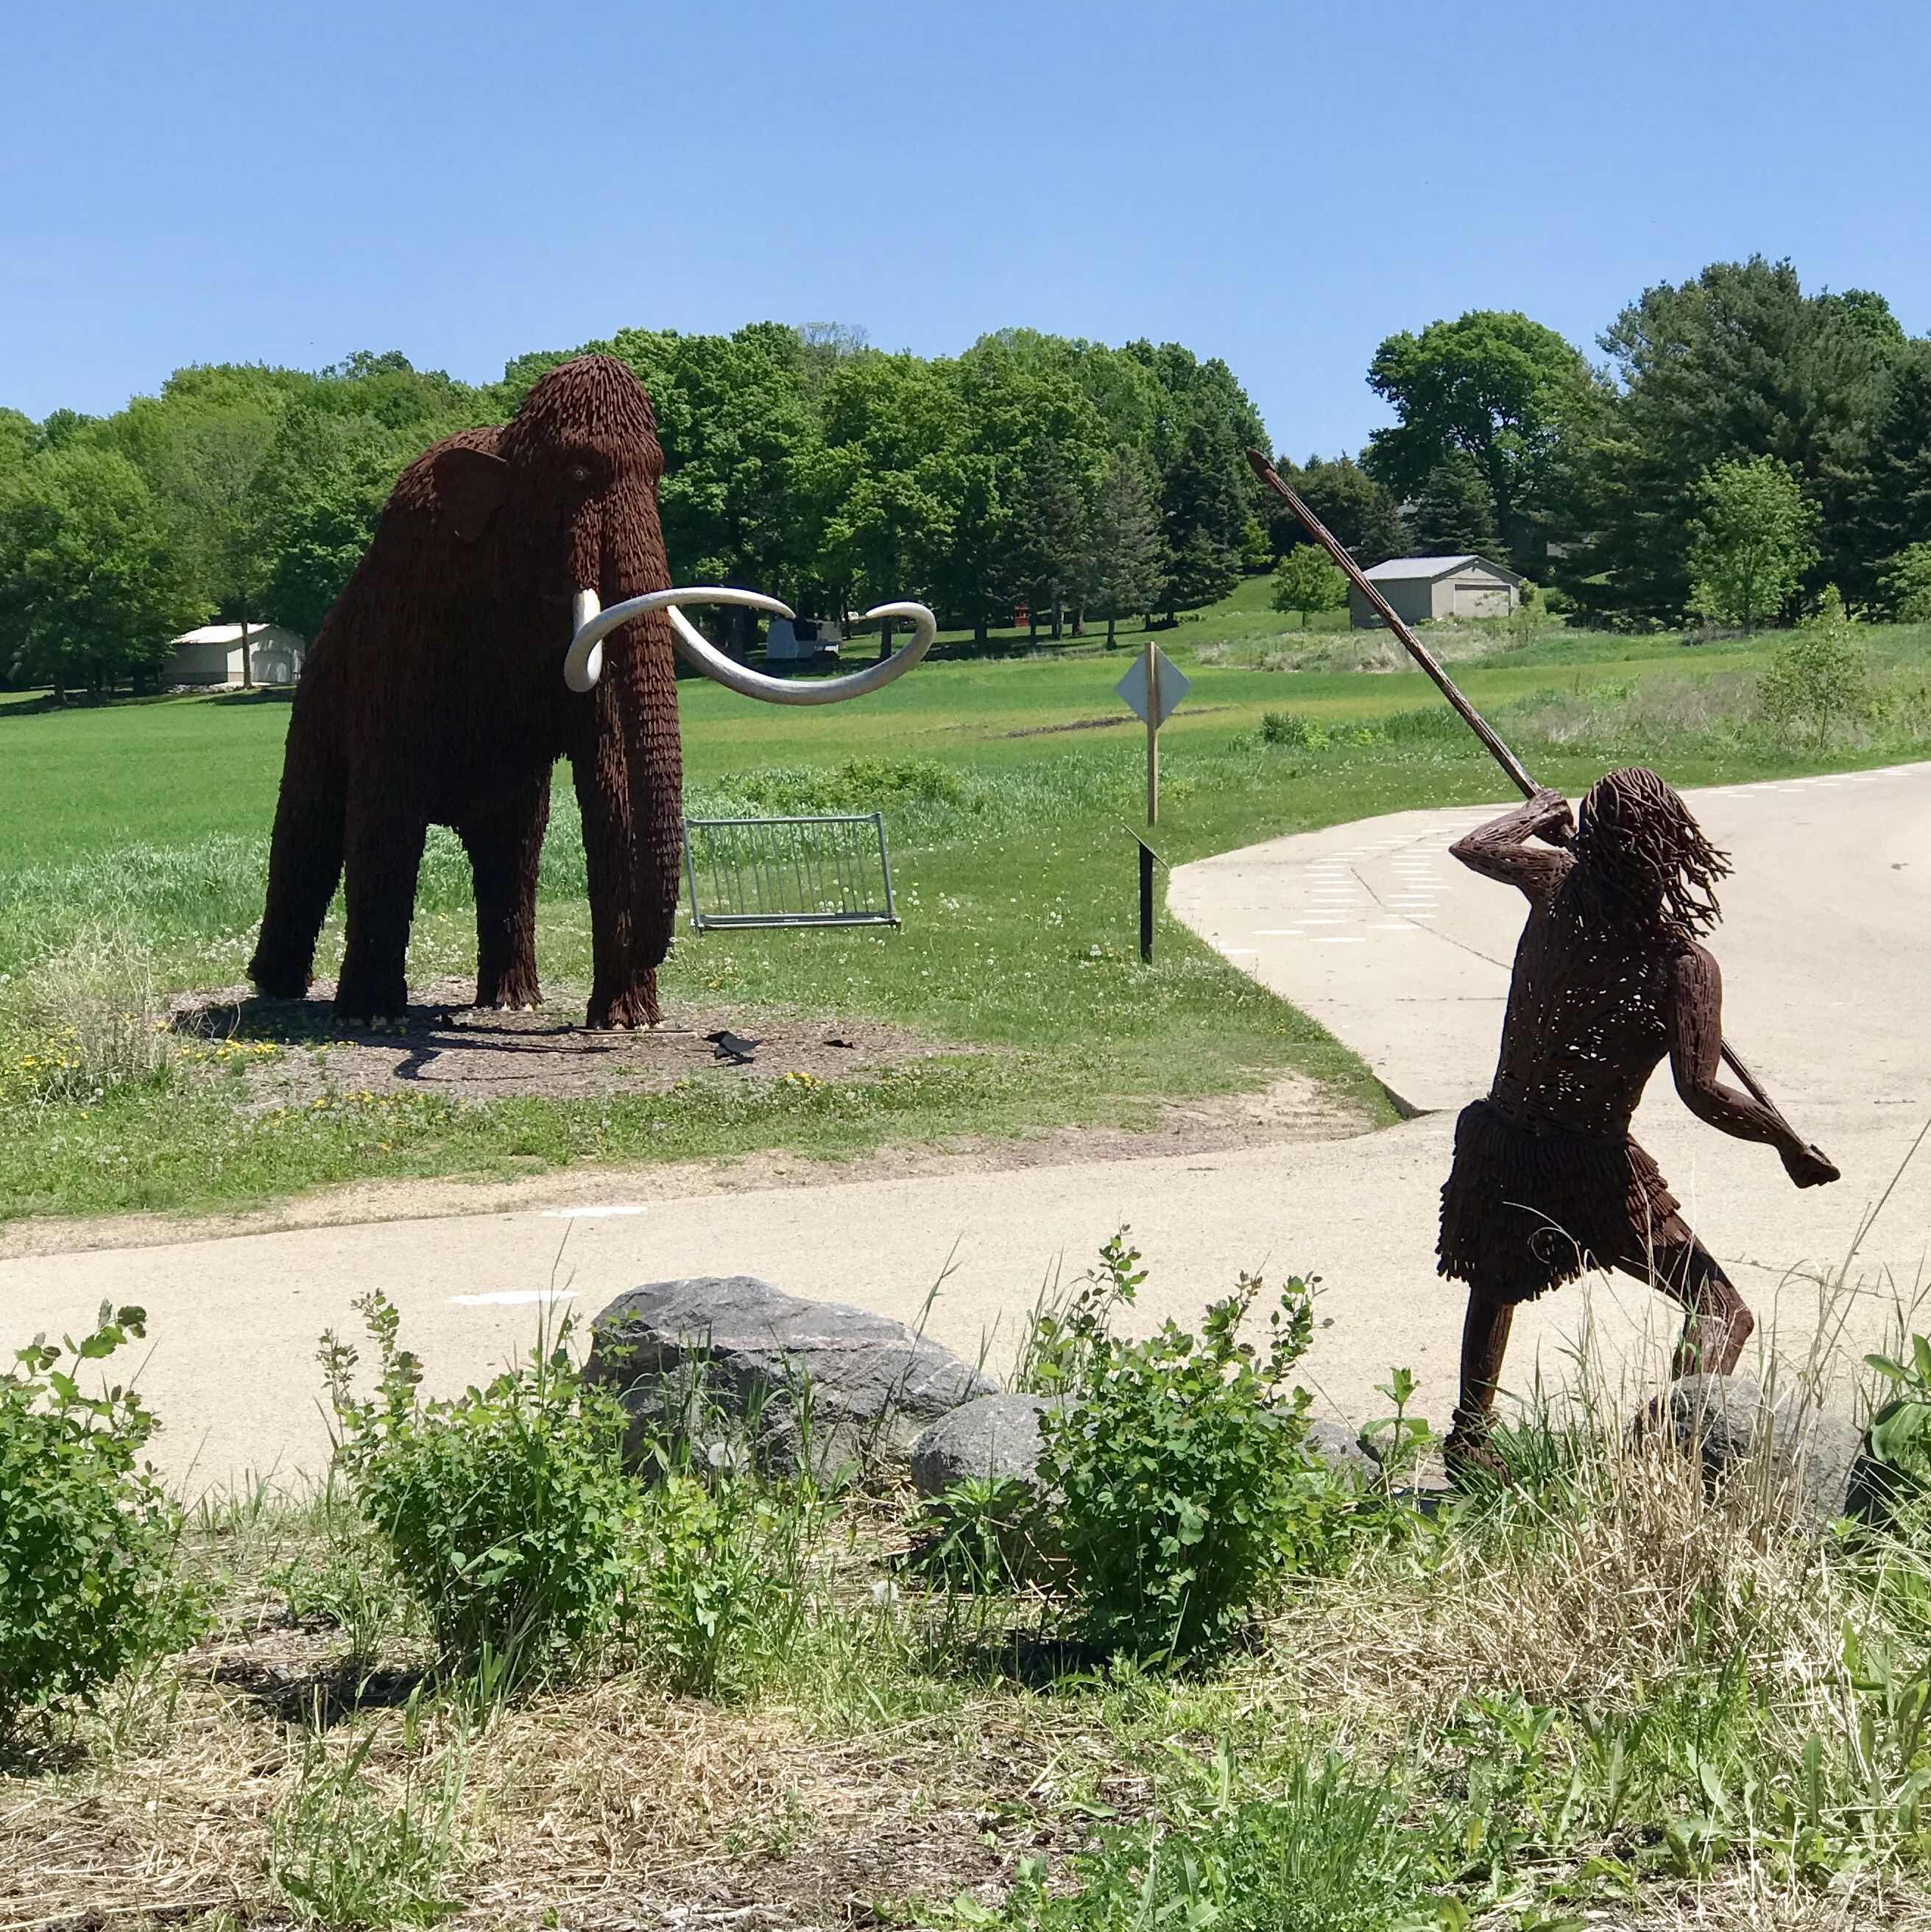 Tubal Cain hunting an antediluvian beast?